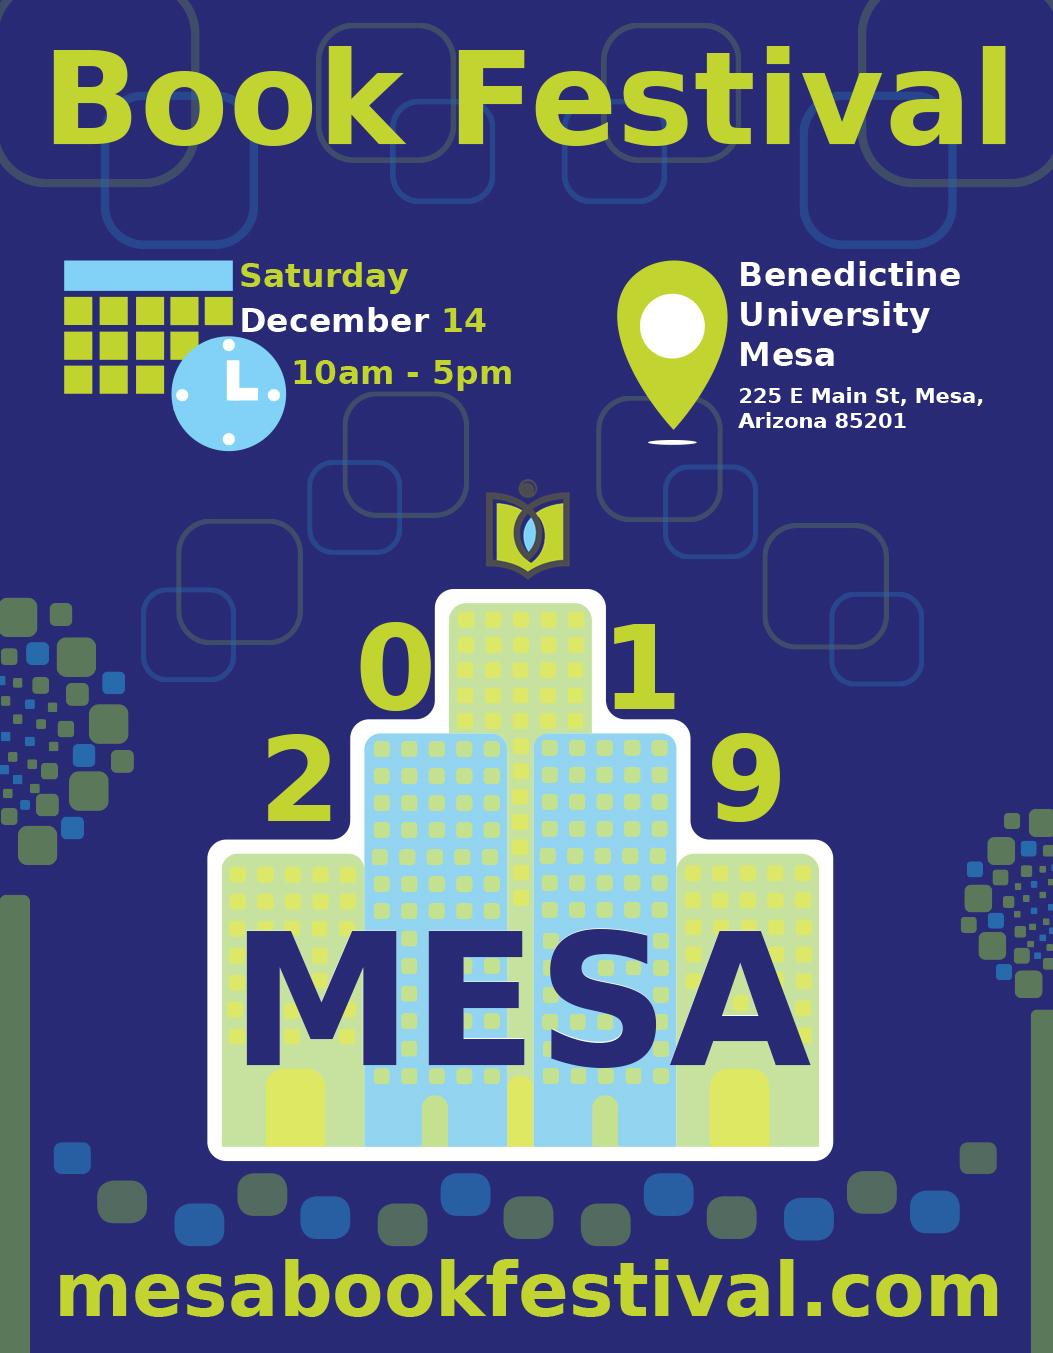 mesa-book-festival-2019.jpg